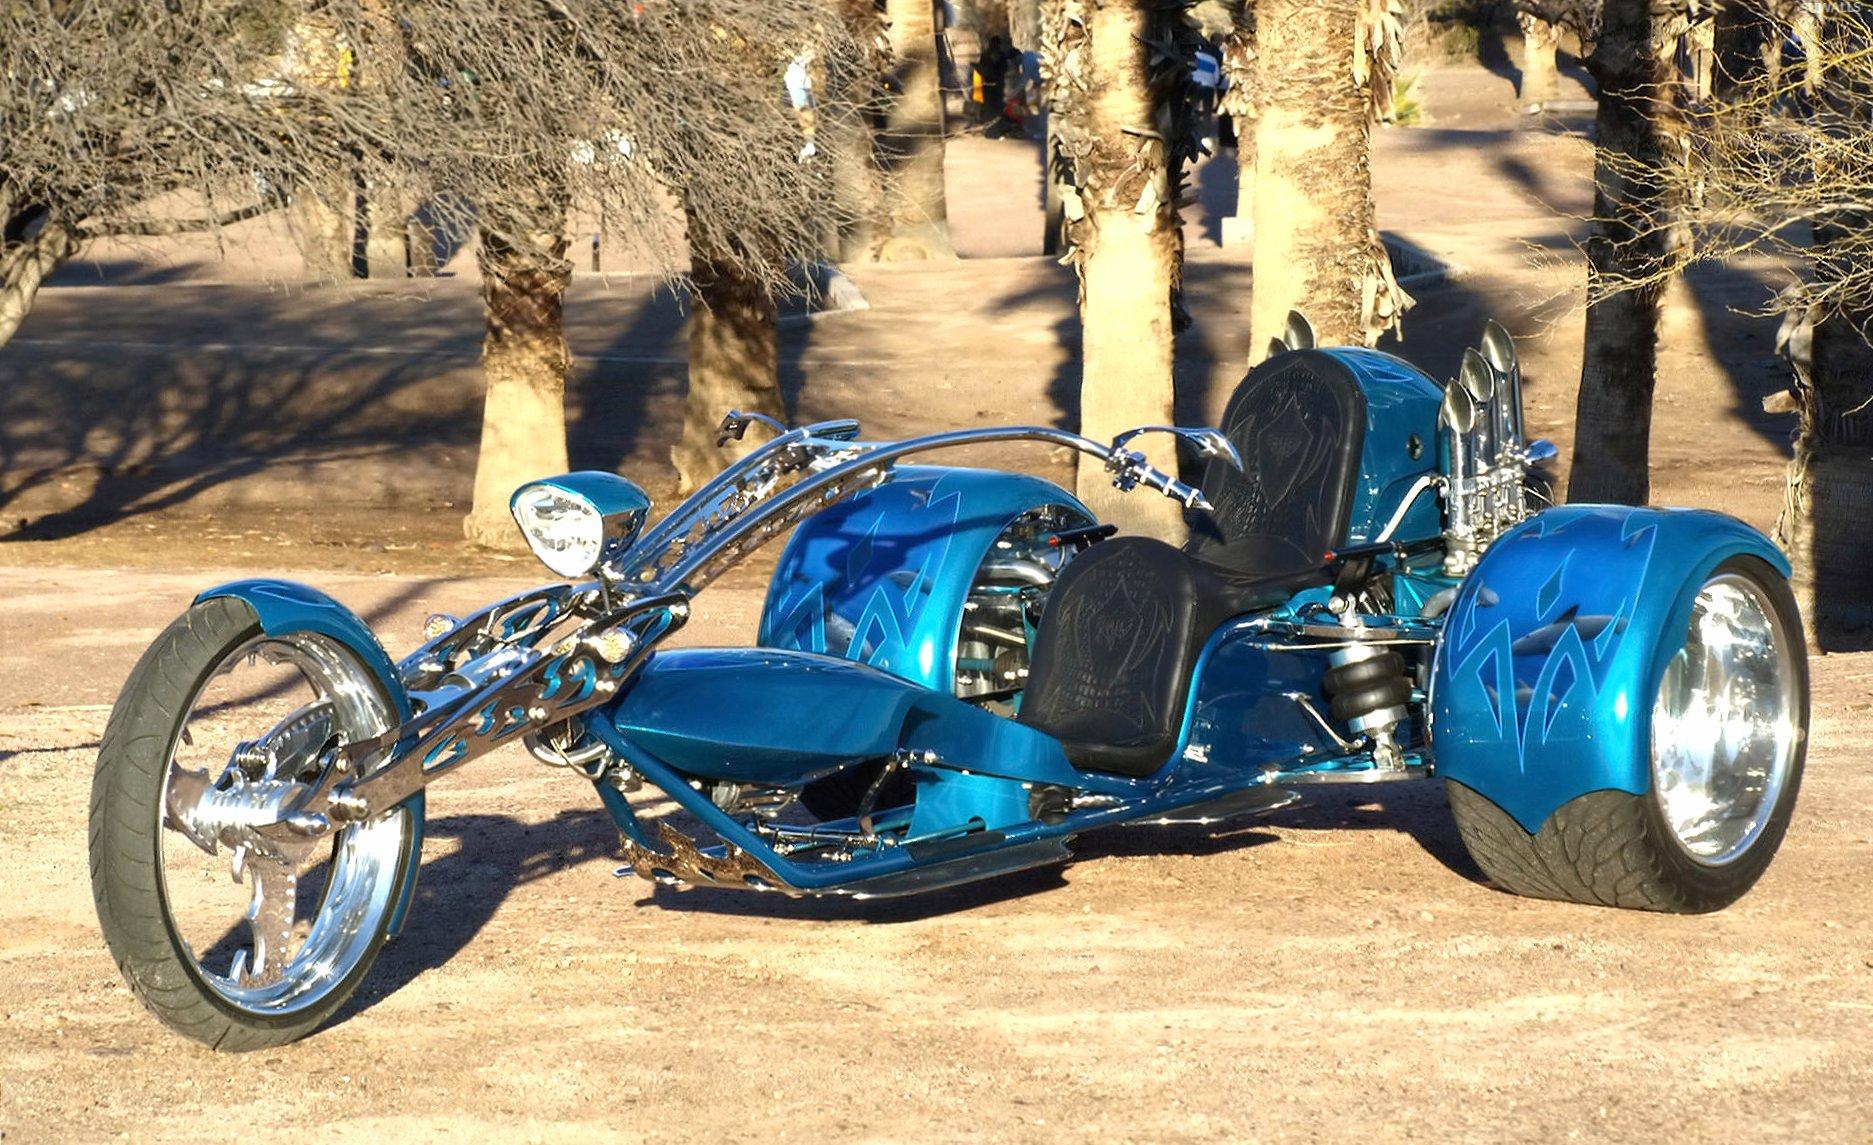 Trike motorbike wallpapers HD quality